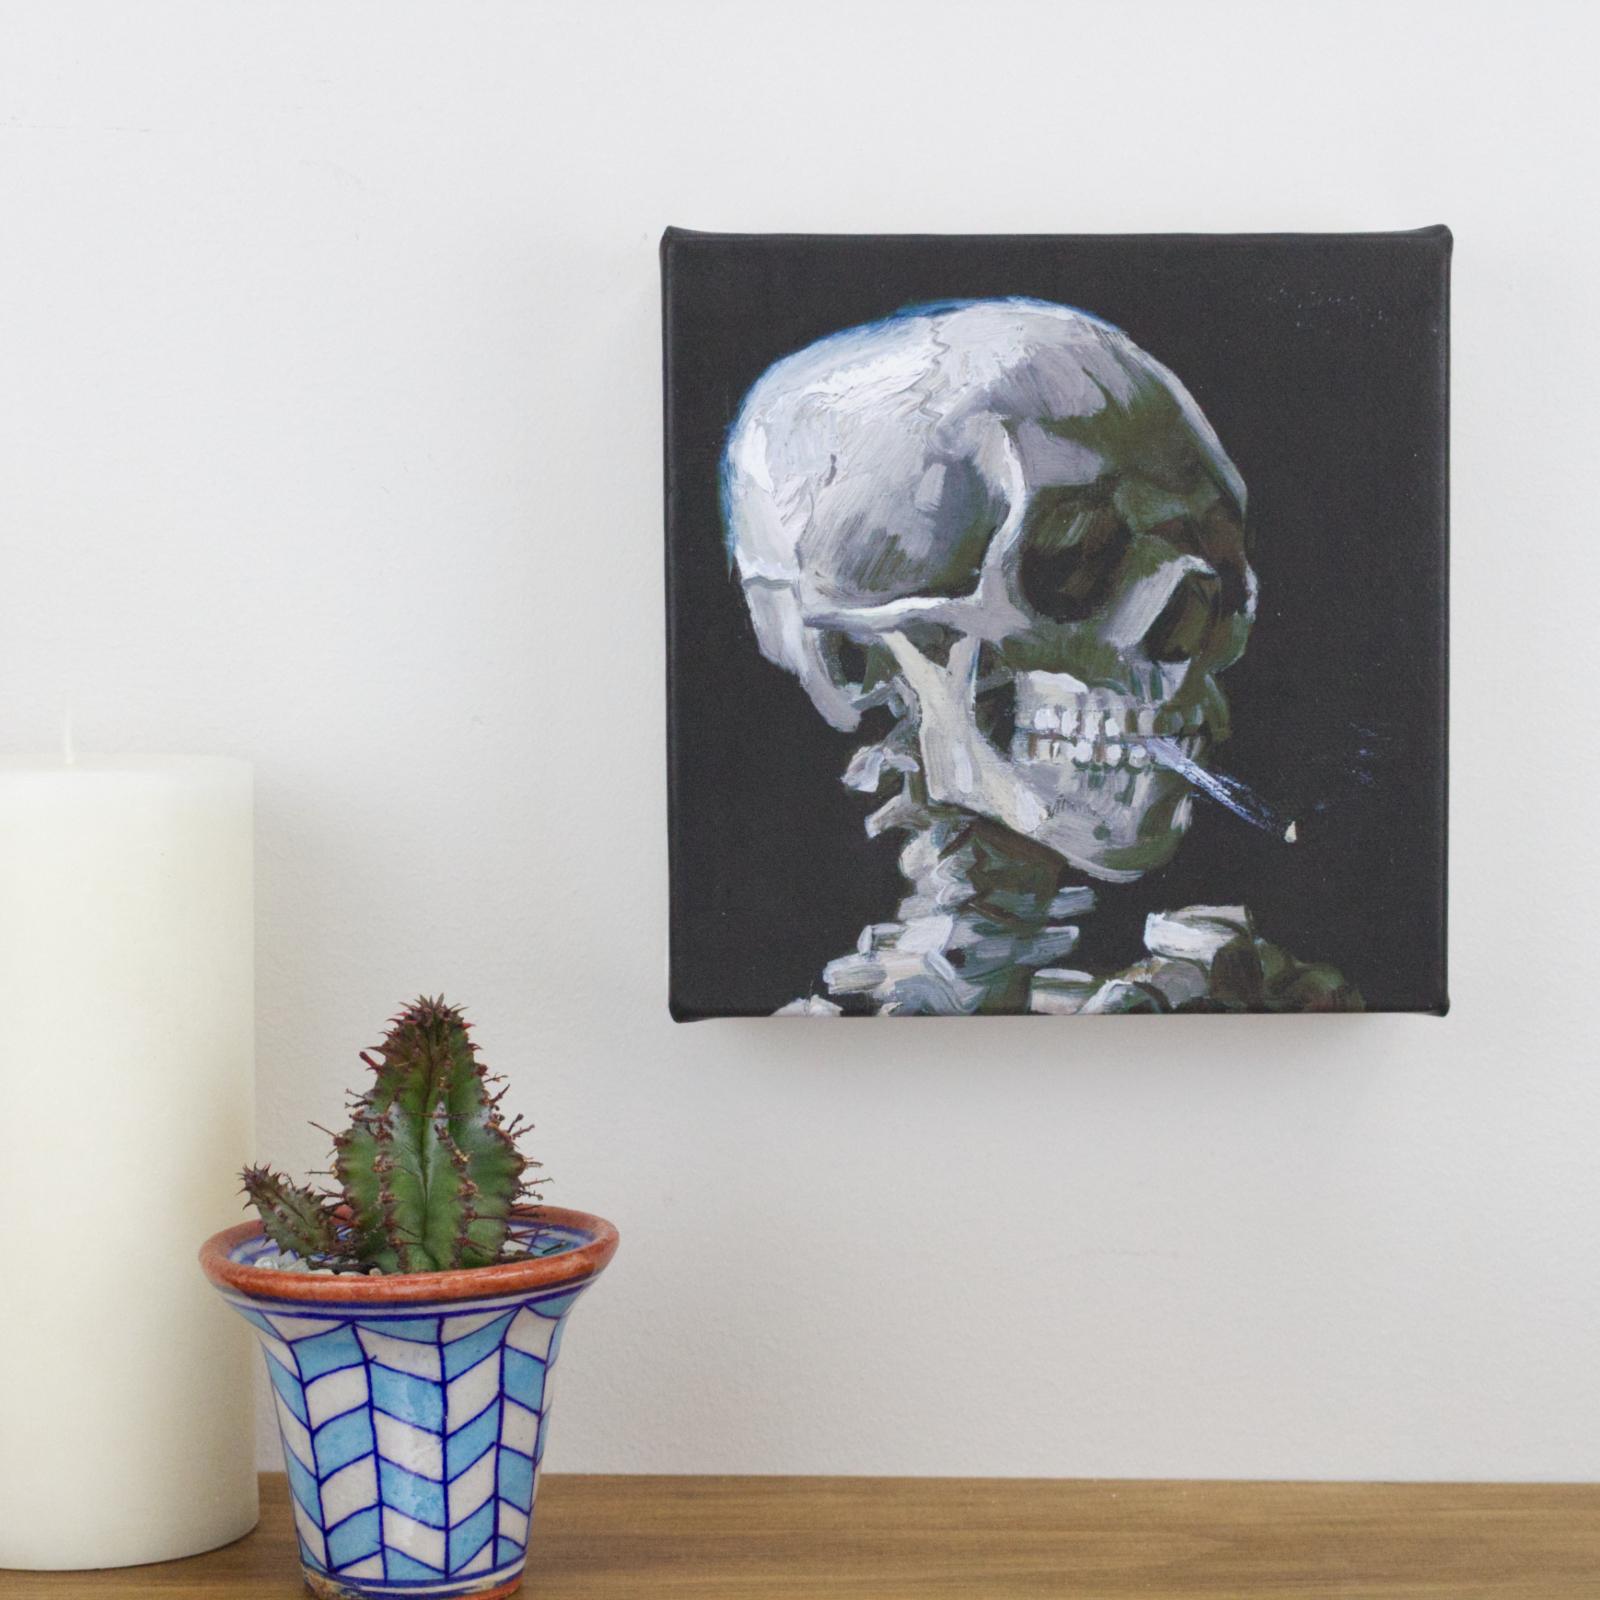 Skull Of A Skeleton With Burning Cigarette Happy Medium